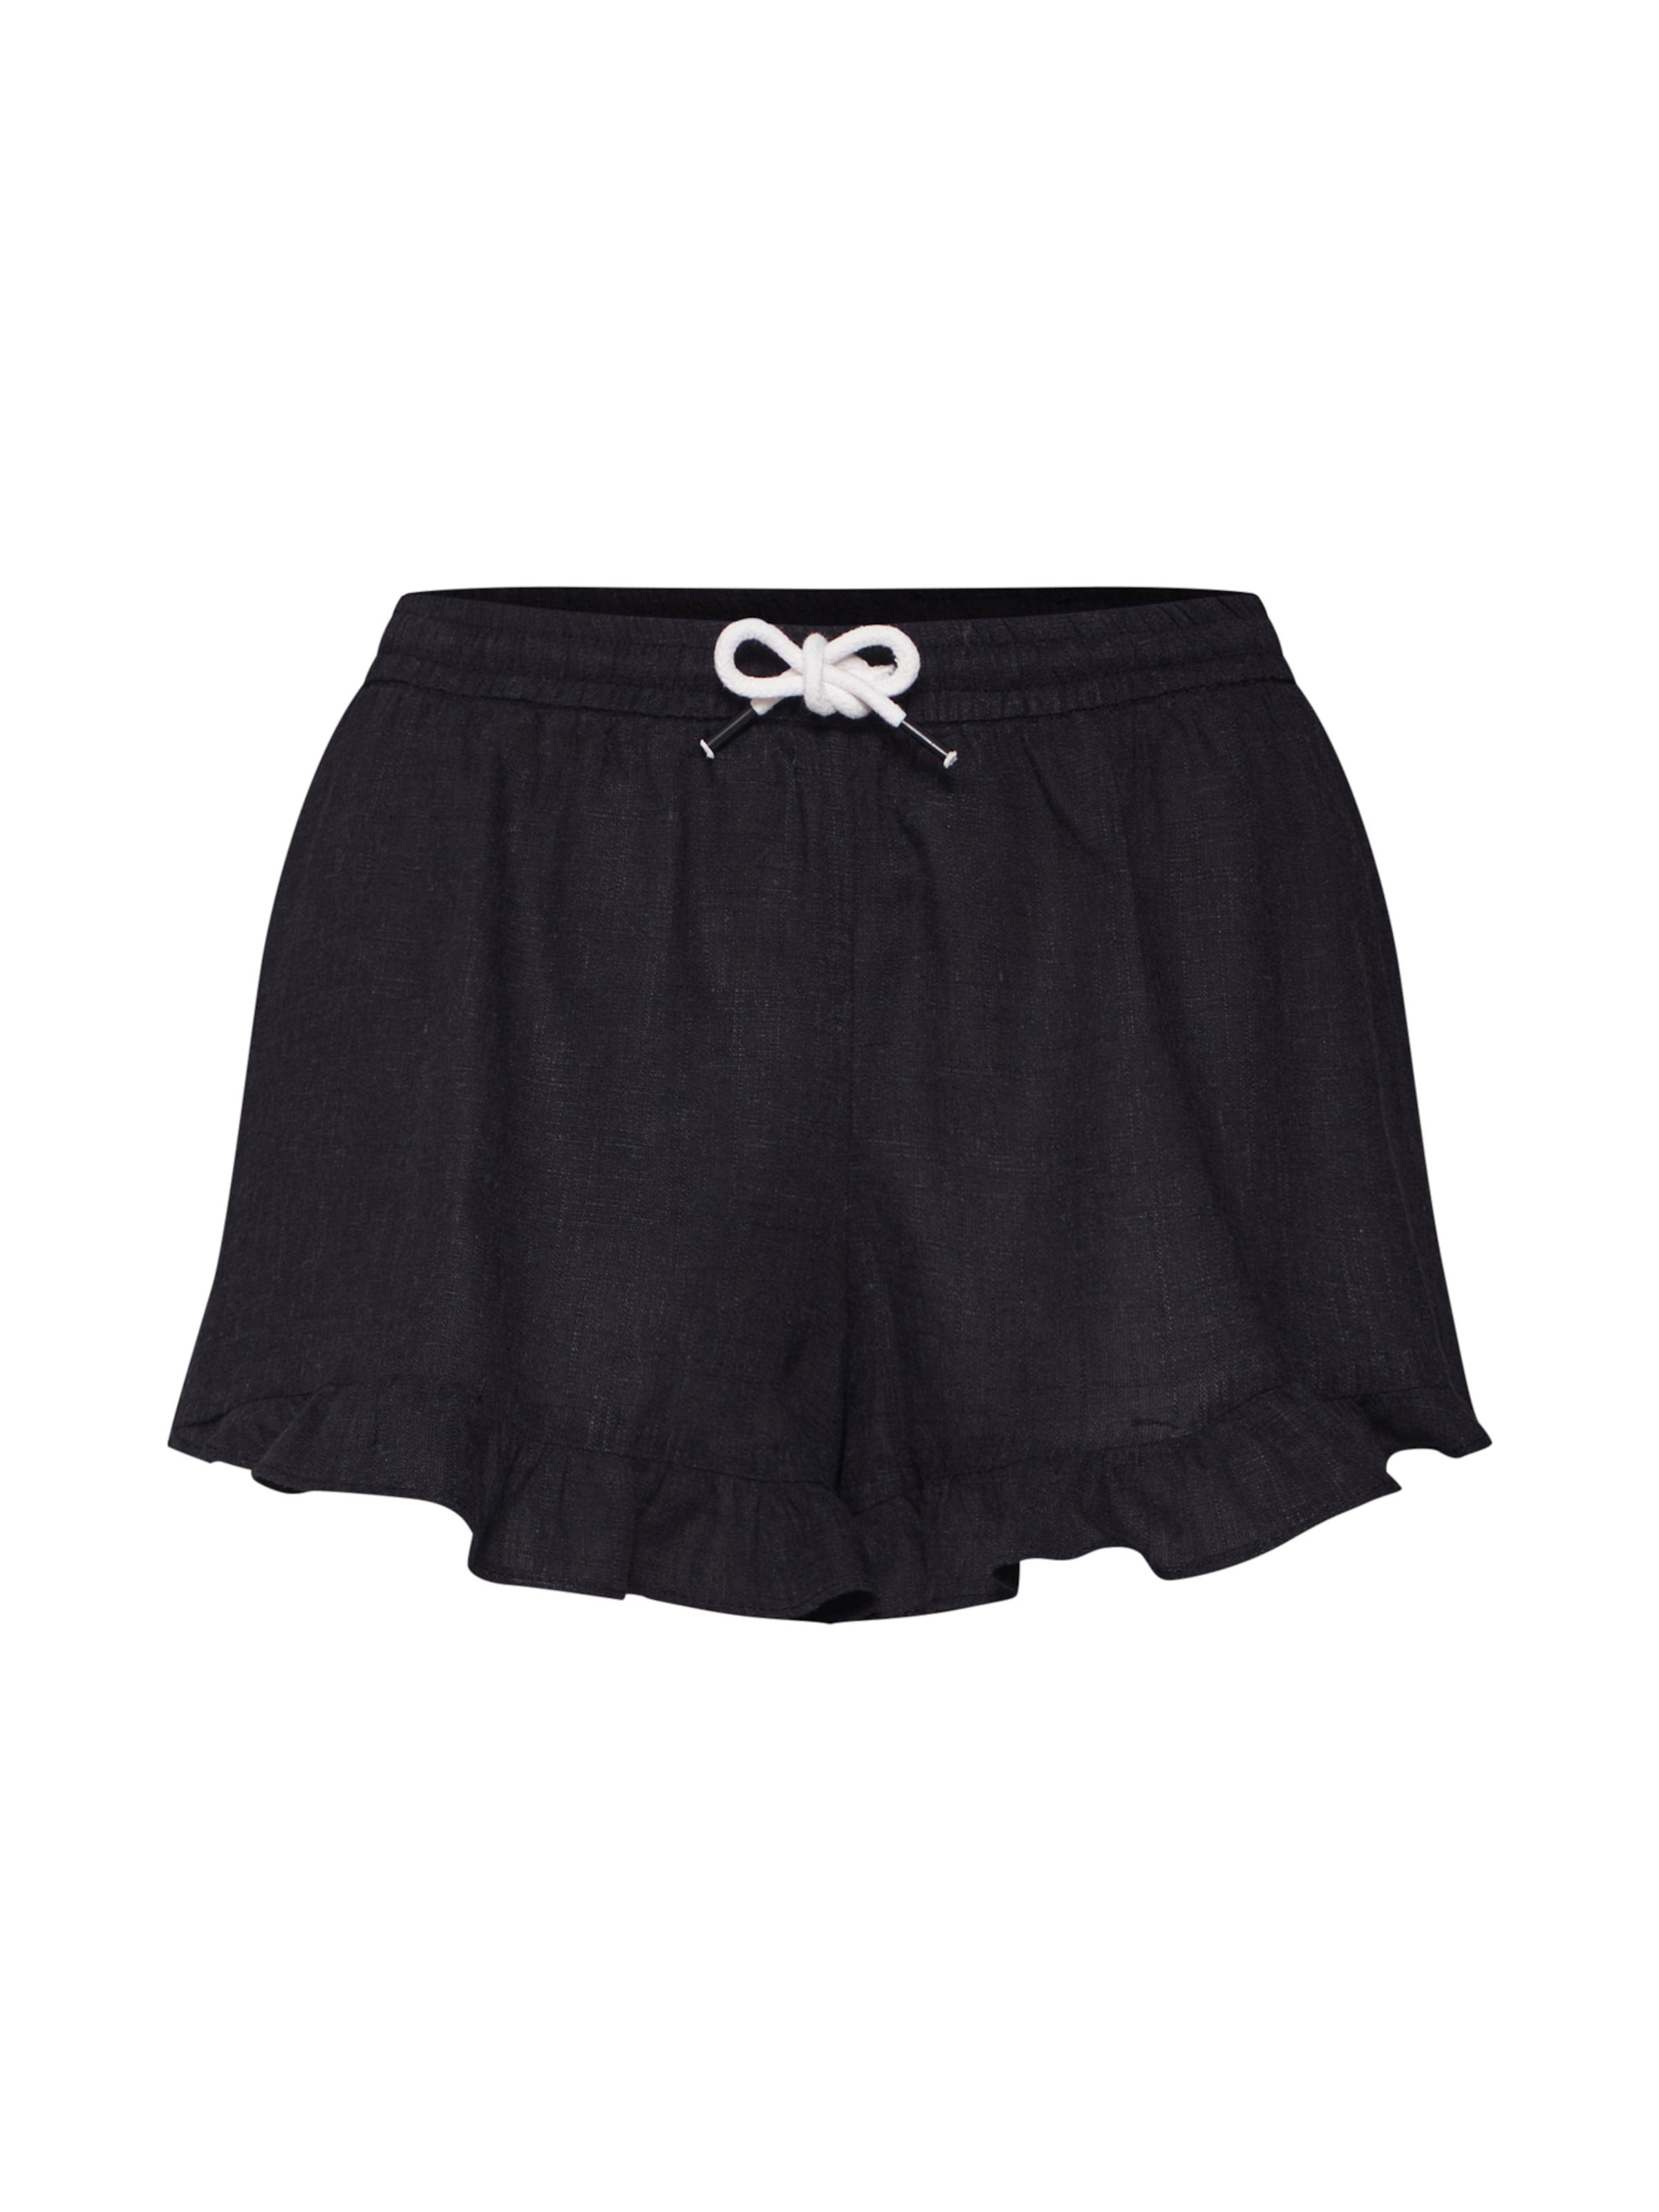 In Review Shorts Schwarz Shorts' 'frill wXiuTZOPk